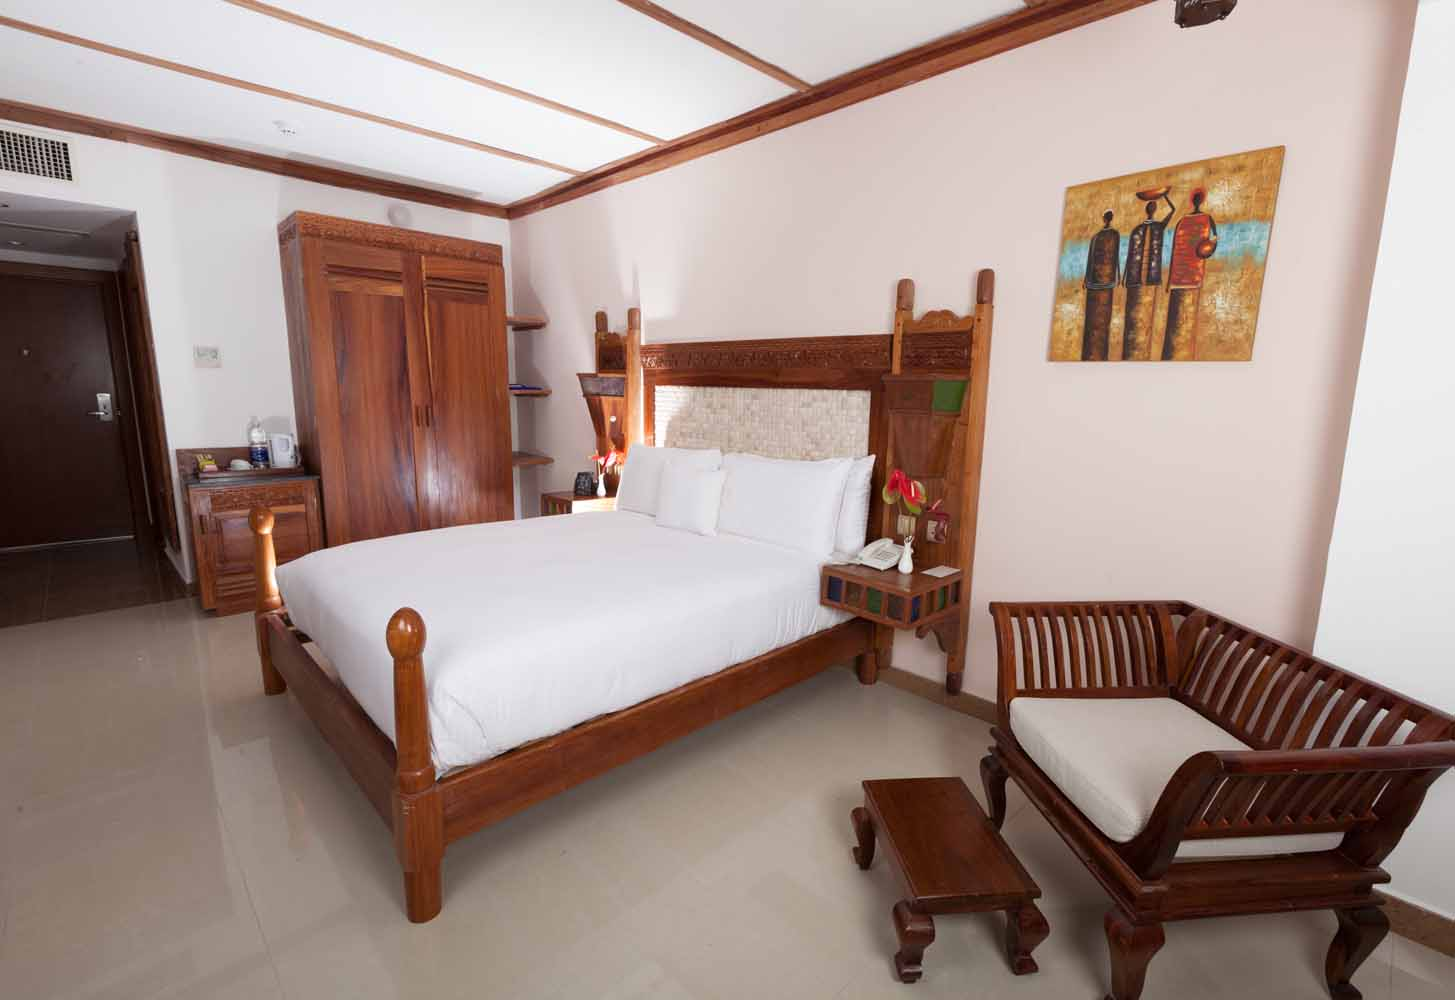 Hilton opens DoubleTree by Hilton Zanzibar